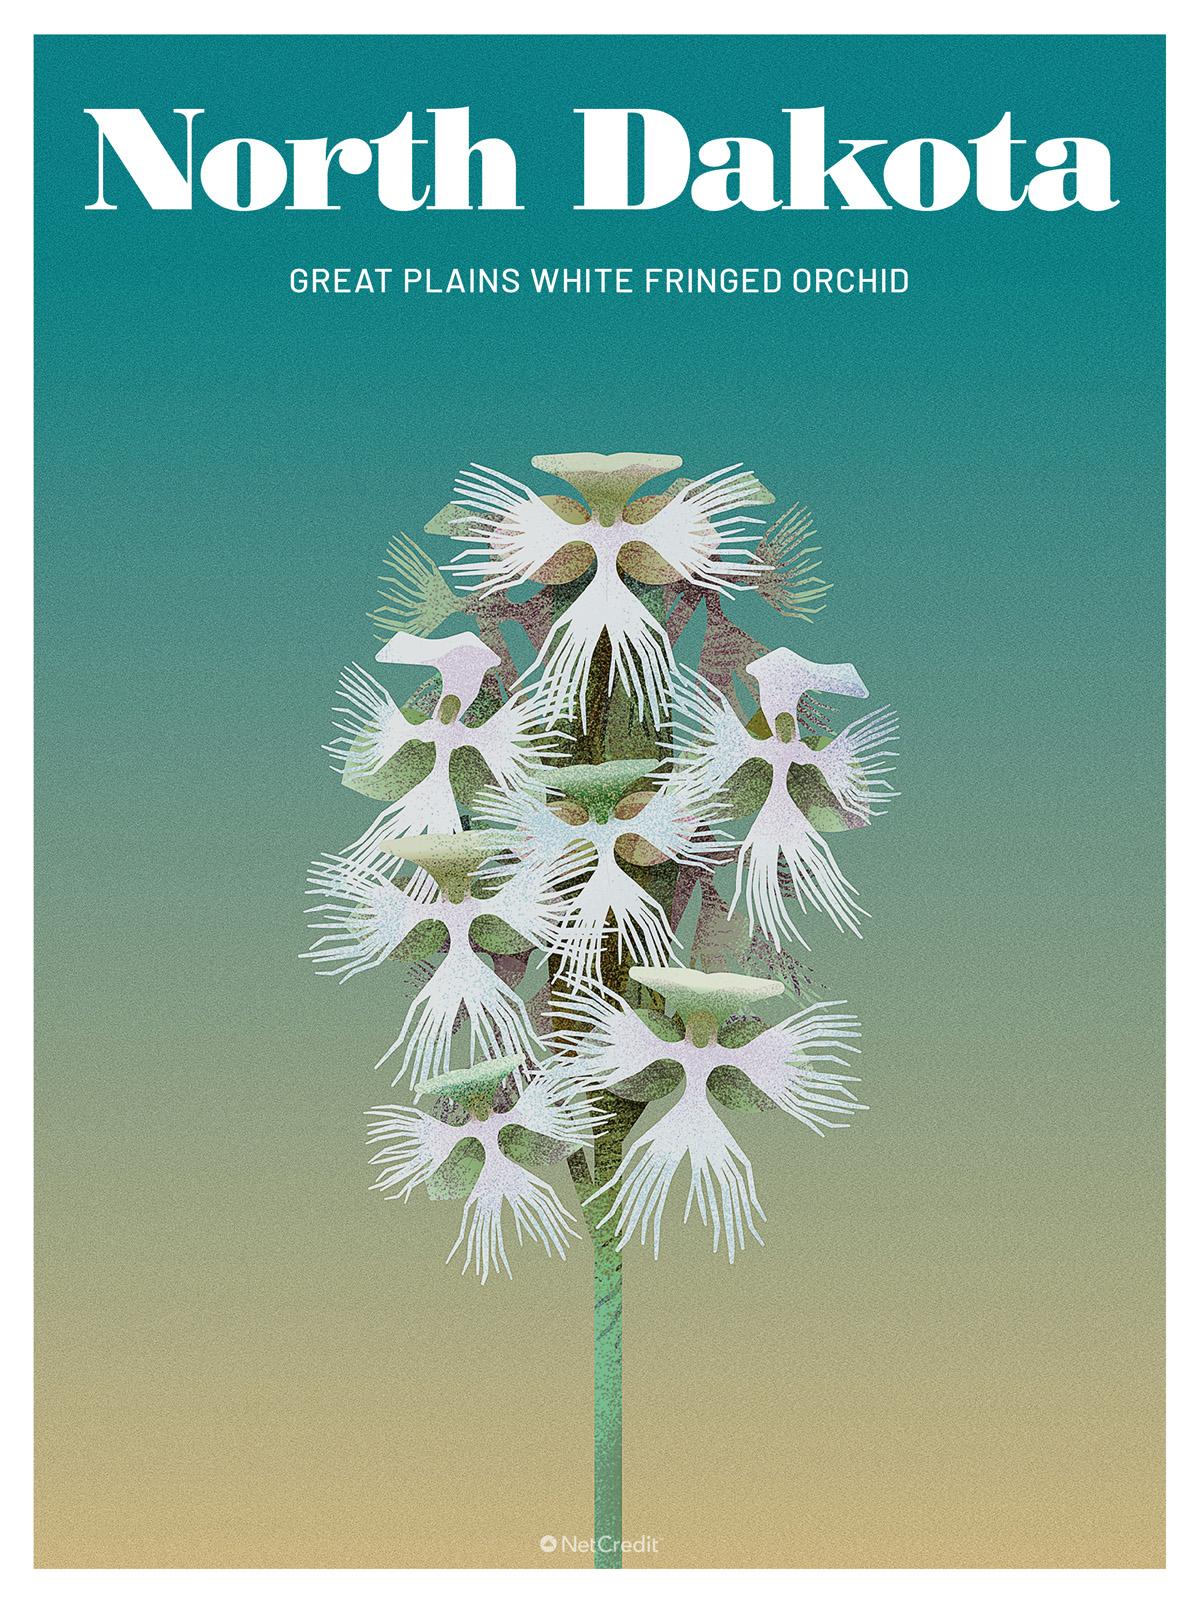 Endangered Plant in North Dakota: Great Plains White Fringed Orchid